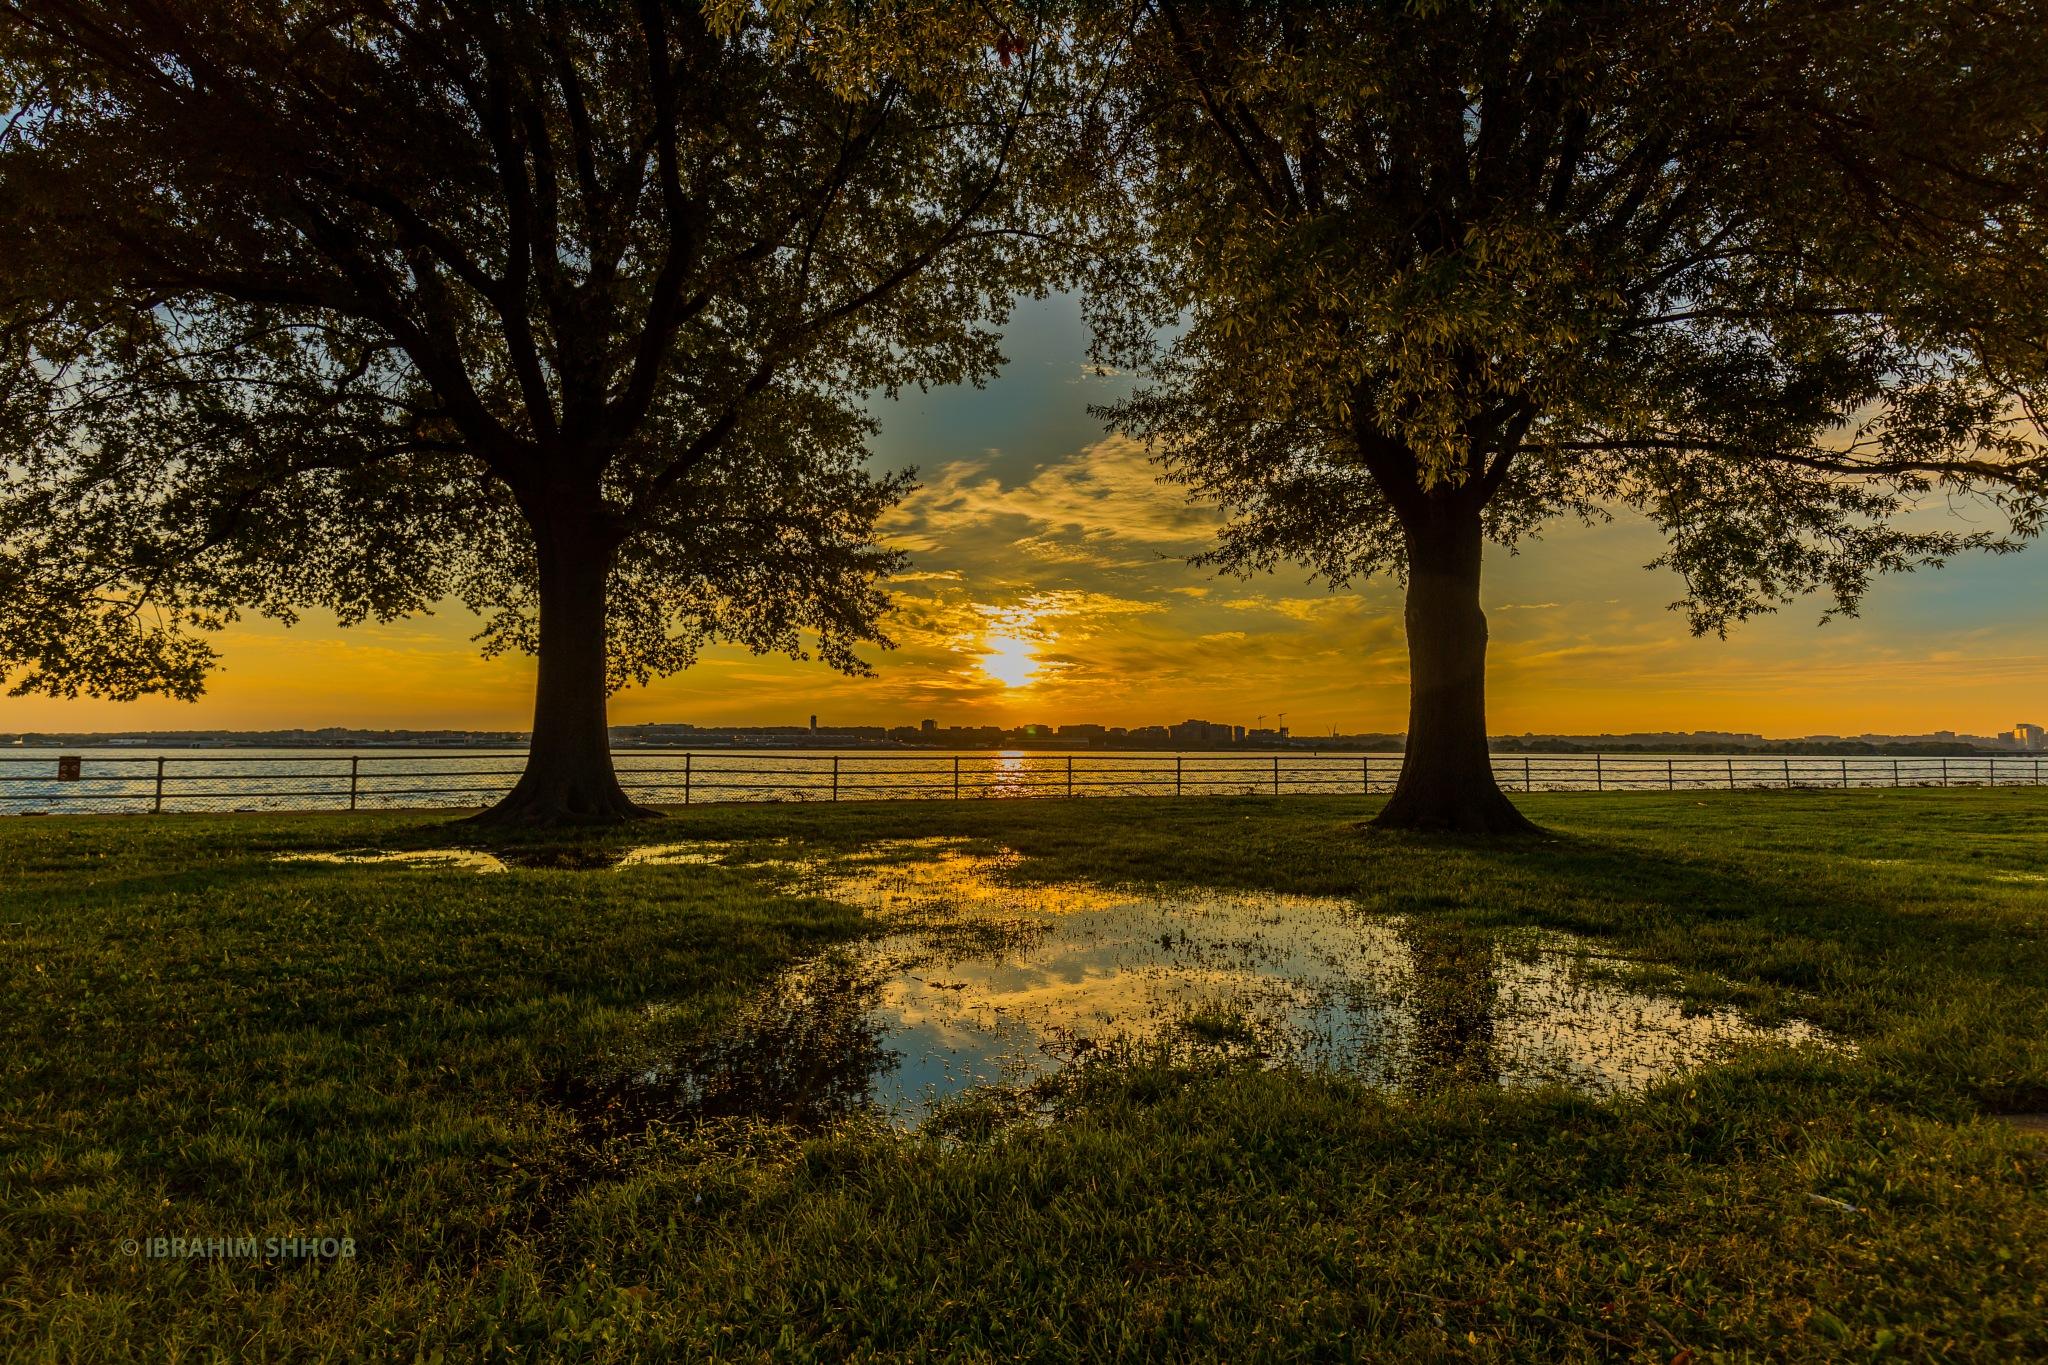 sunset by Ibrahim shhob